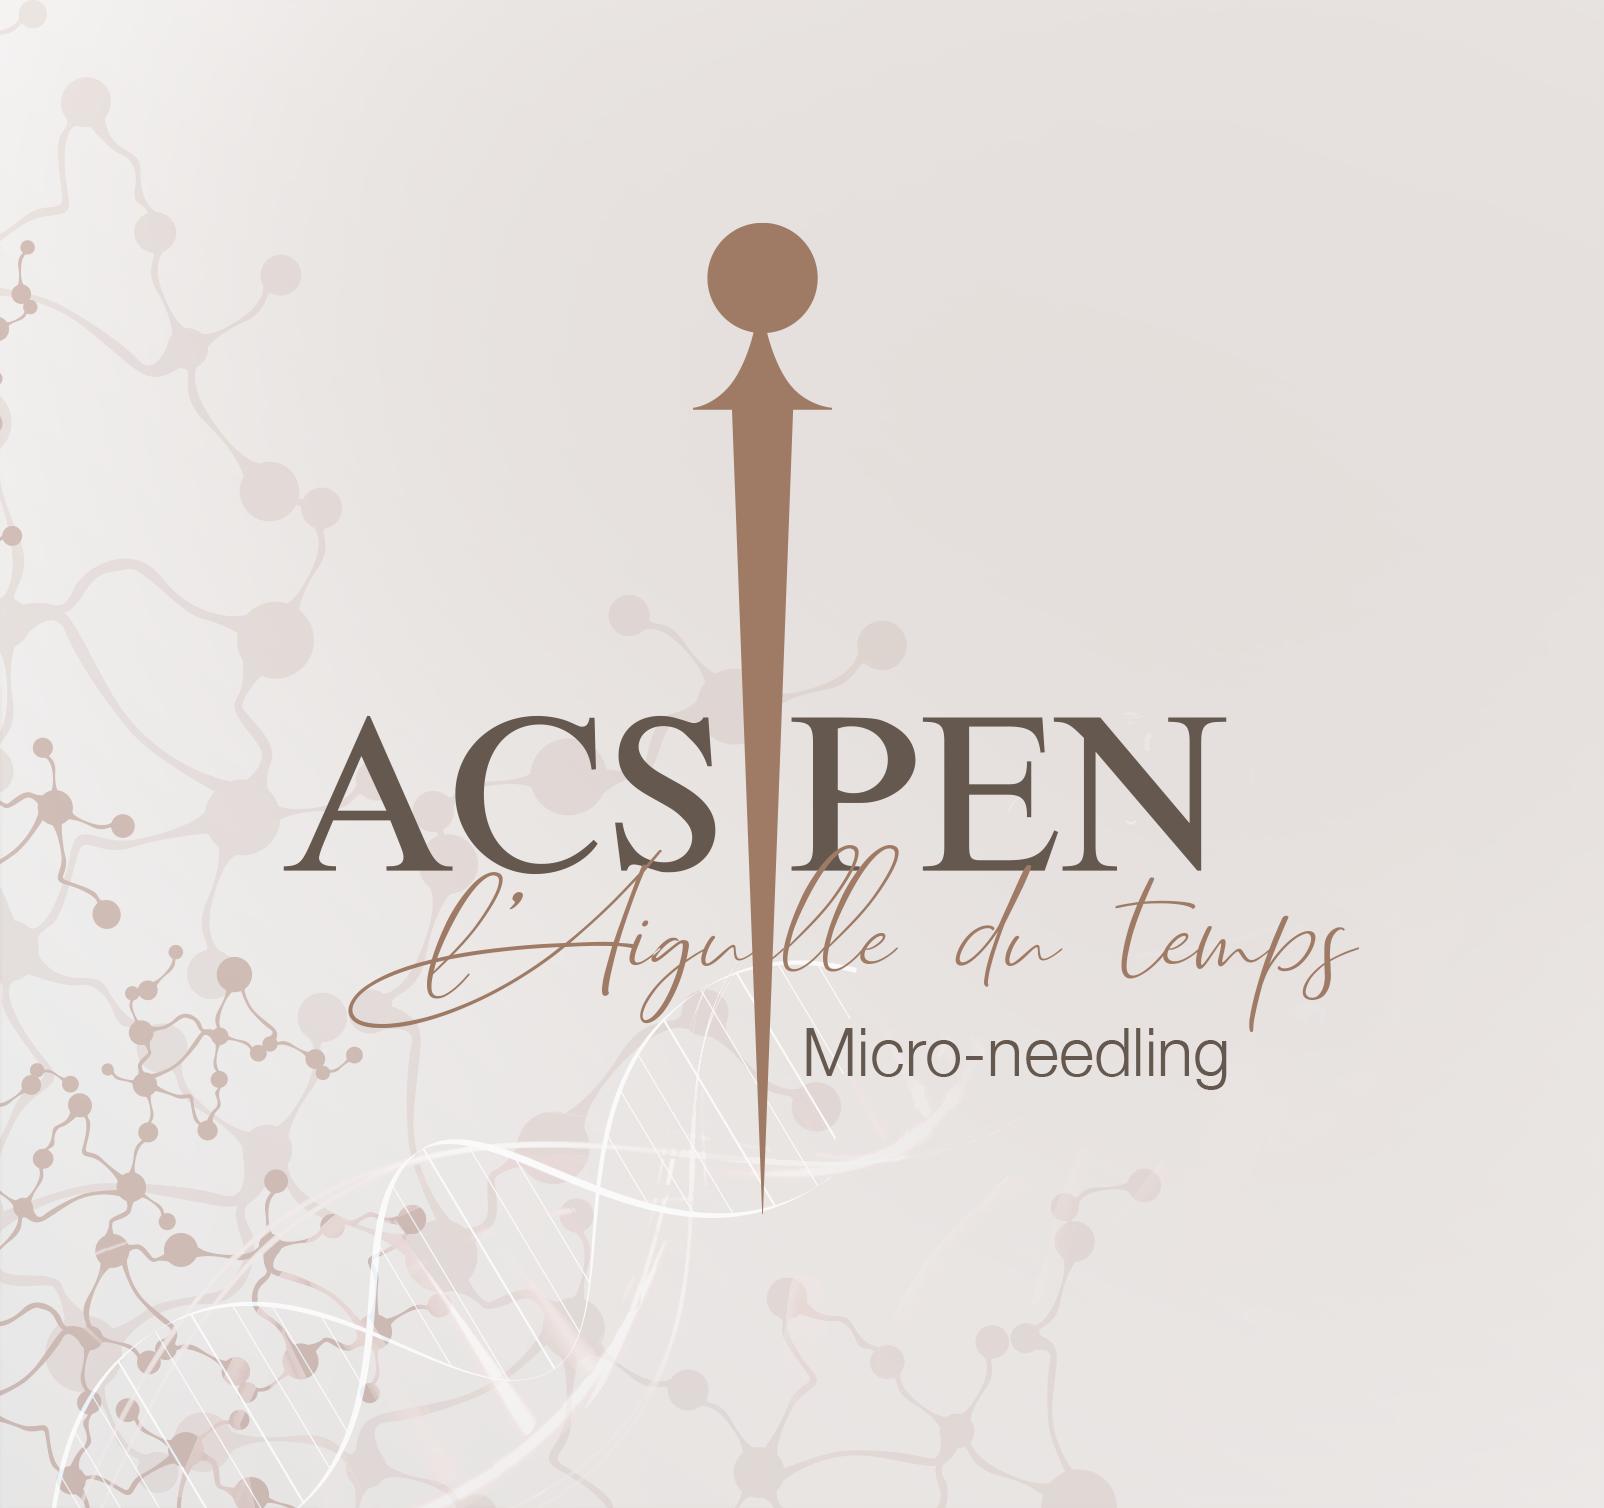 ACS-Pen logo.png